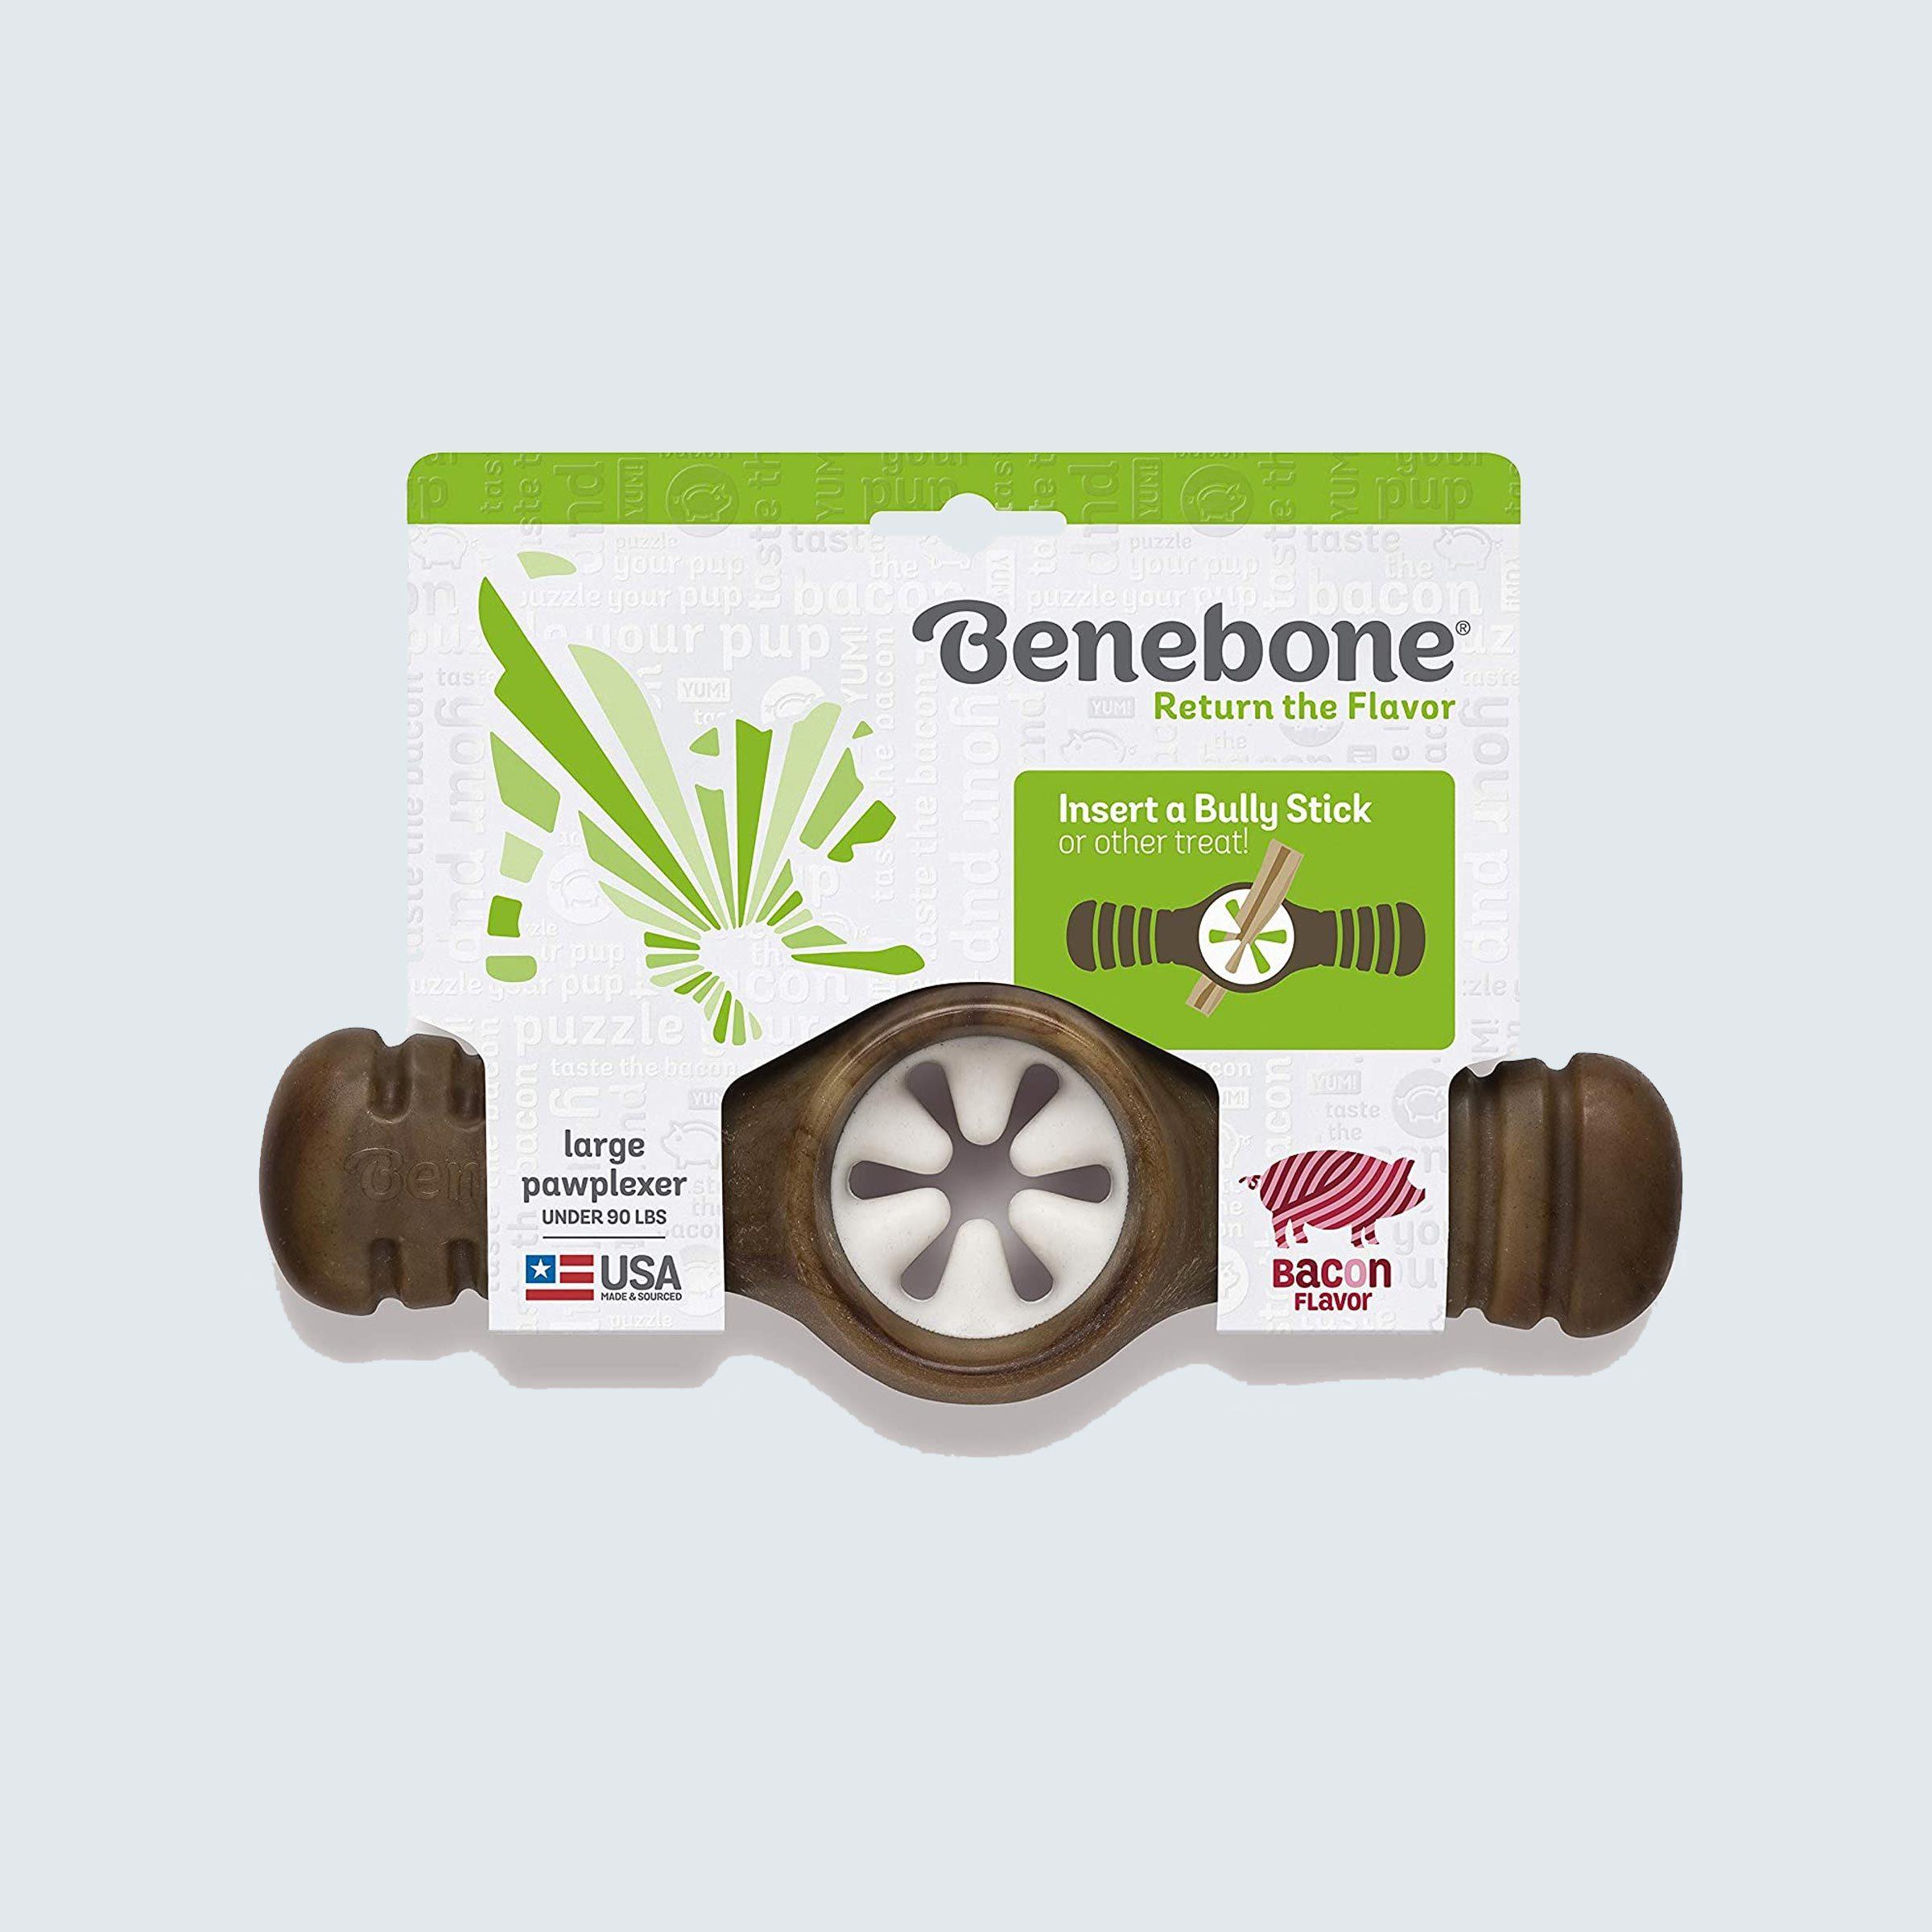 Benebone doggie chew toys